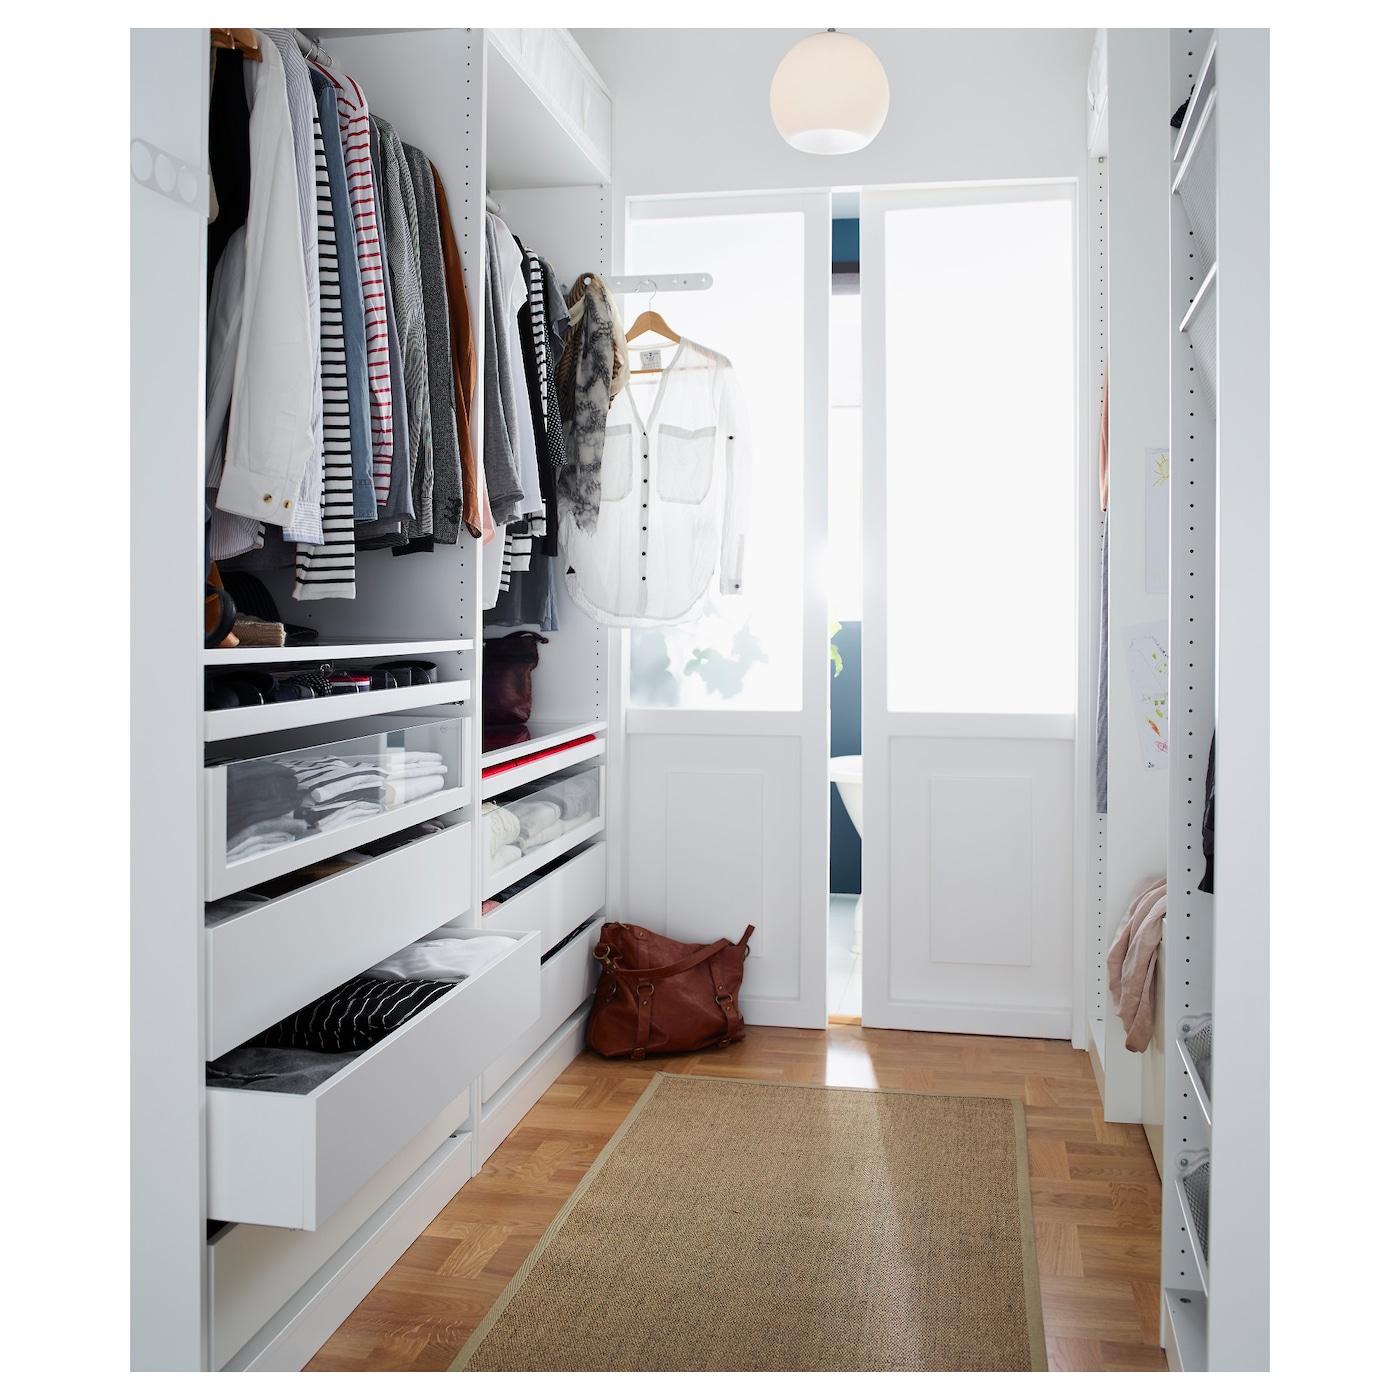 osted rug flatwoven brown 80x240 cm ikea. Black Bedroom Furniture Sets. Home Design Ideas